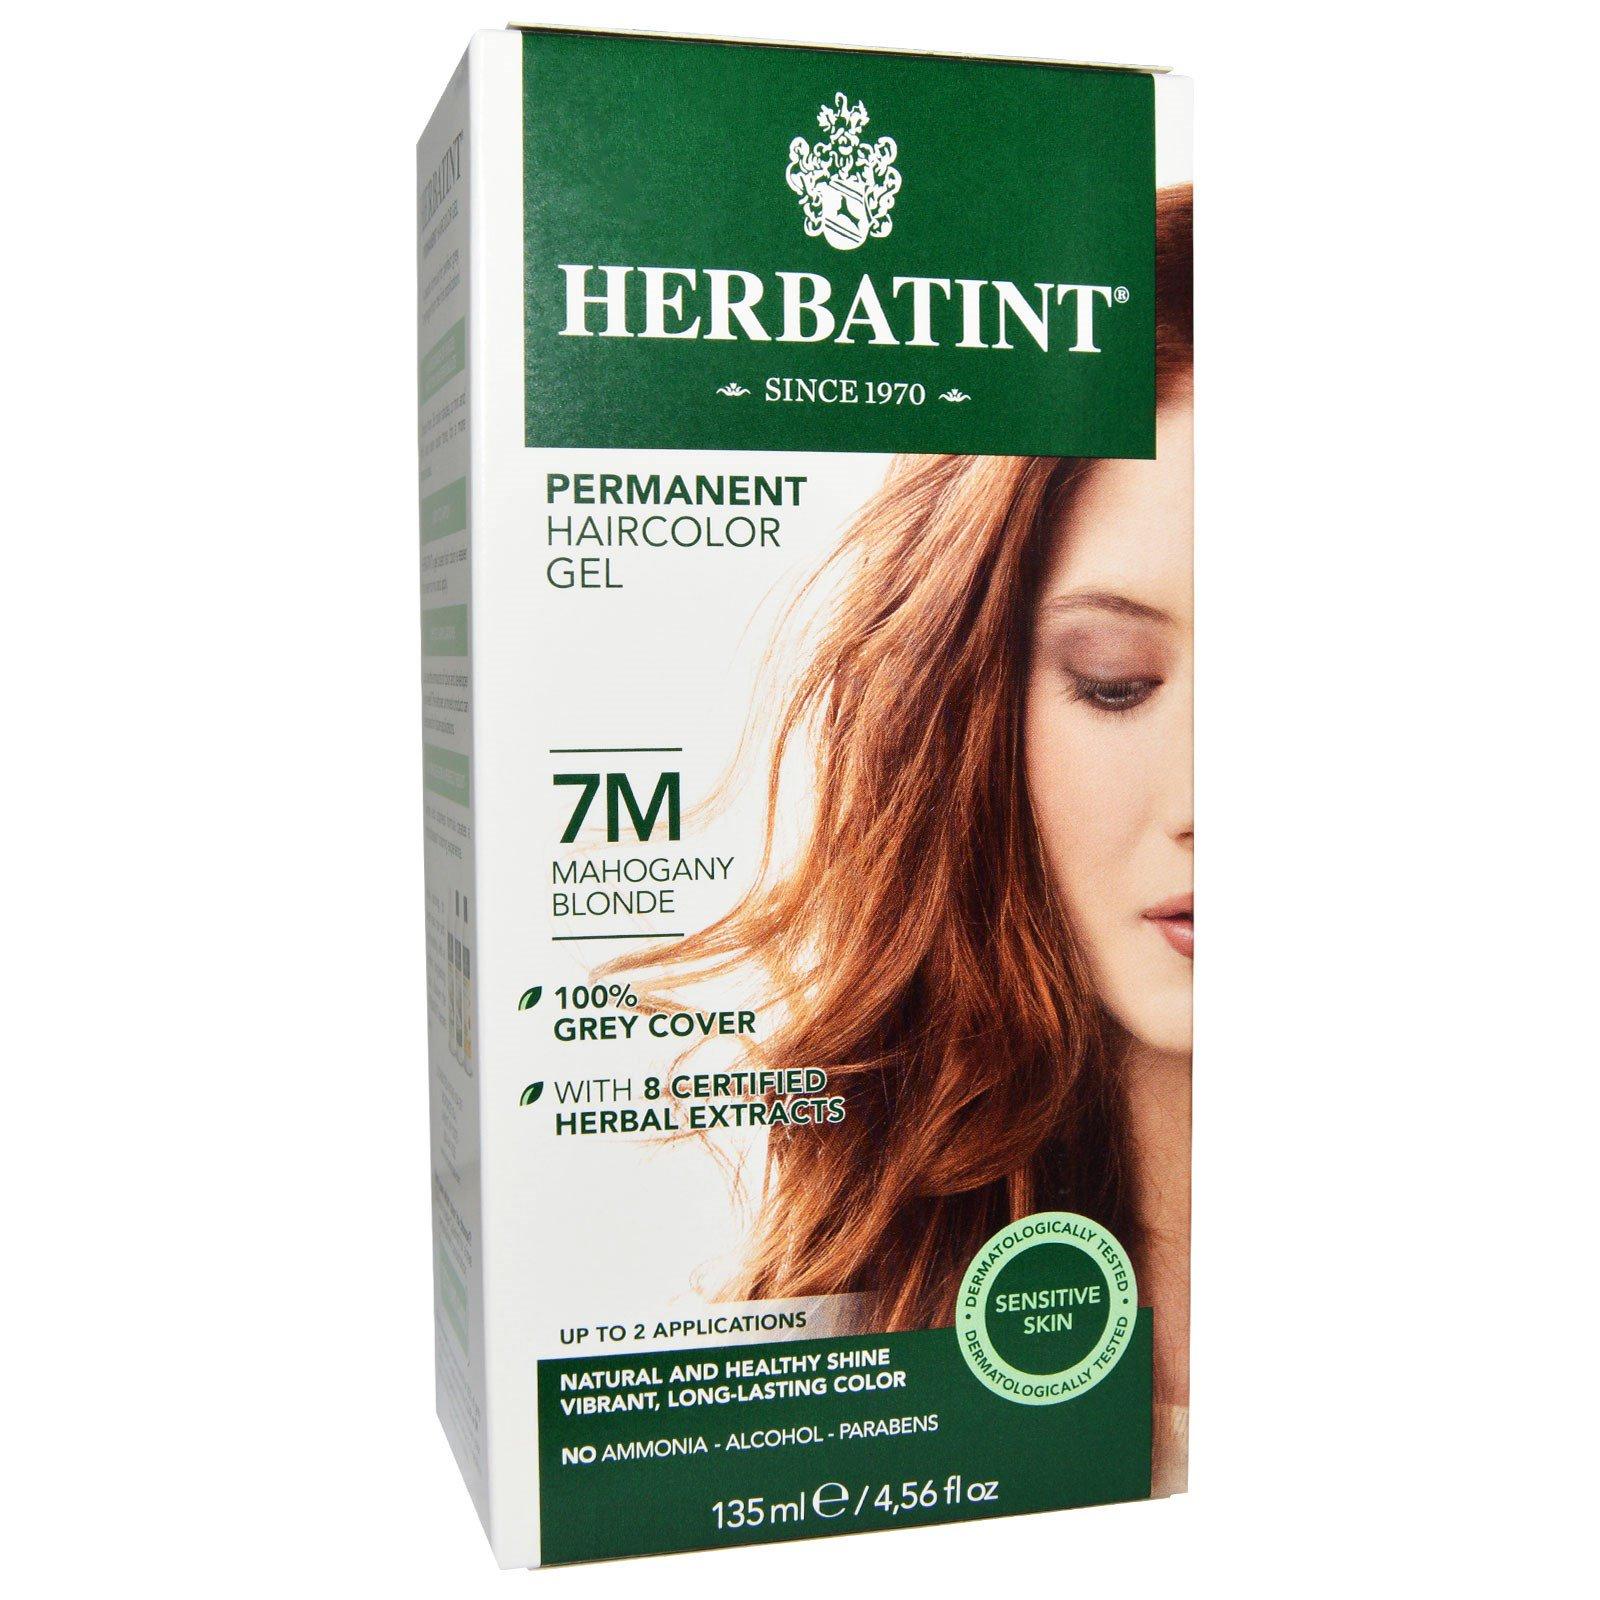 Herbatint Permanent Haircolor Gel 7m Mahogany Blonde 456 Fl Oz